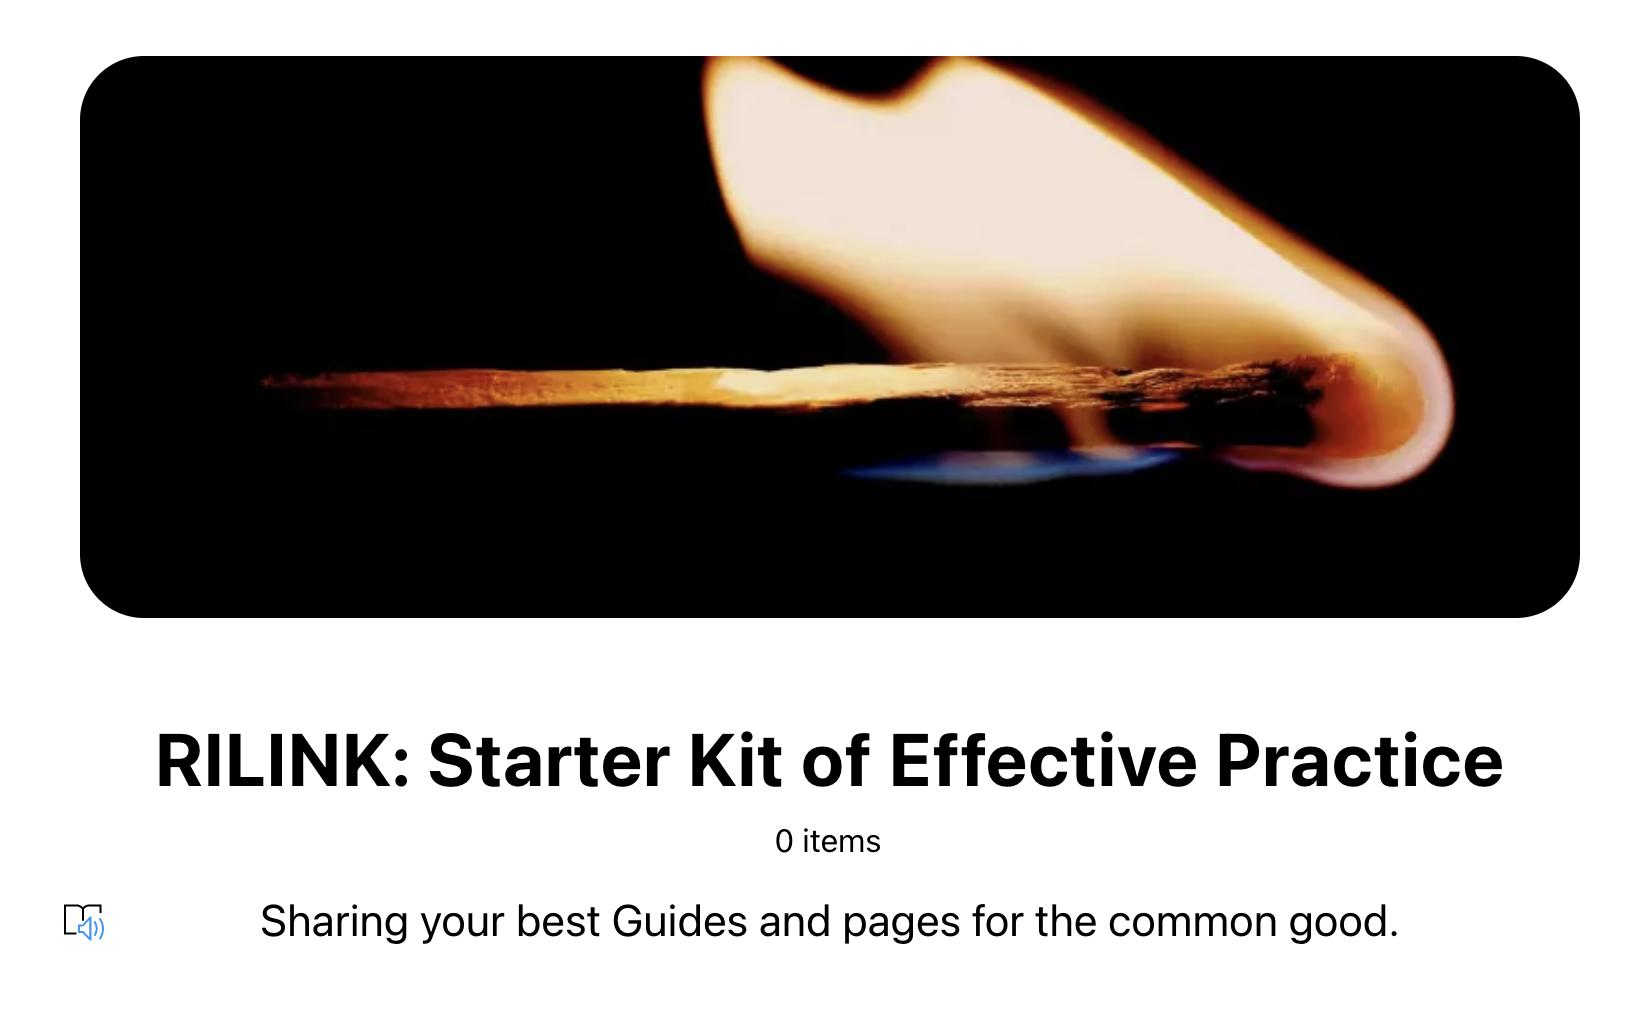 RILINK: Starter Kit for Effective Practice